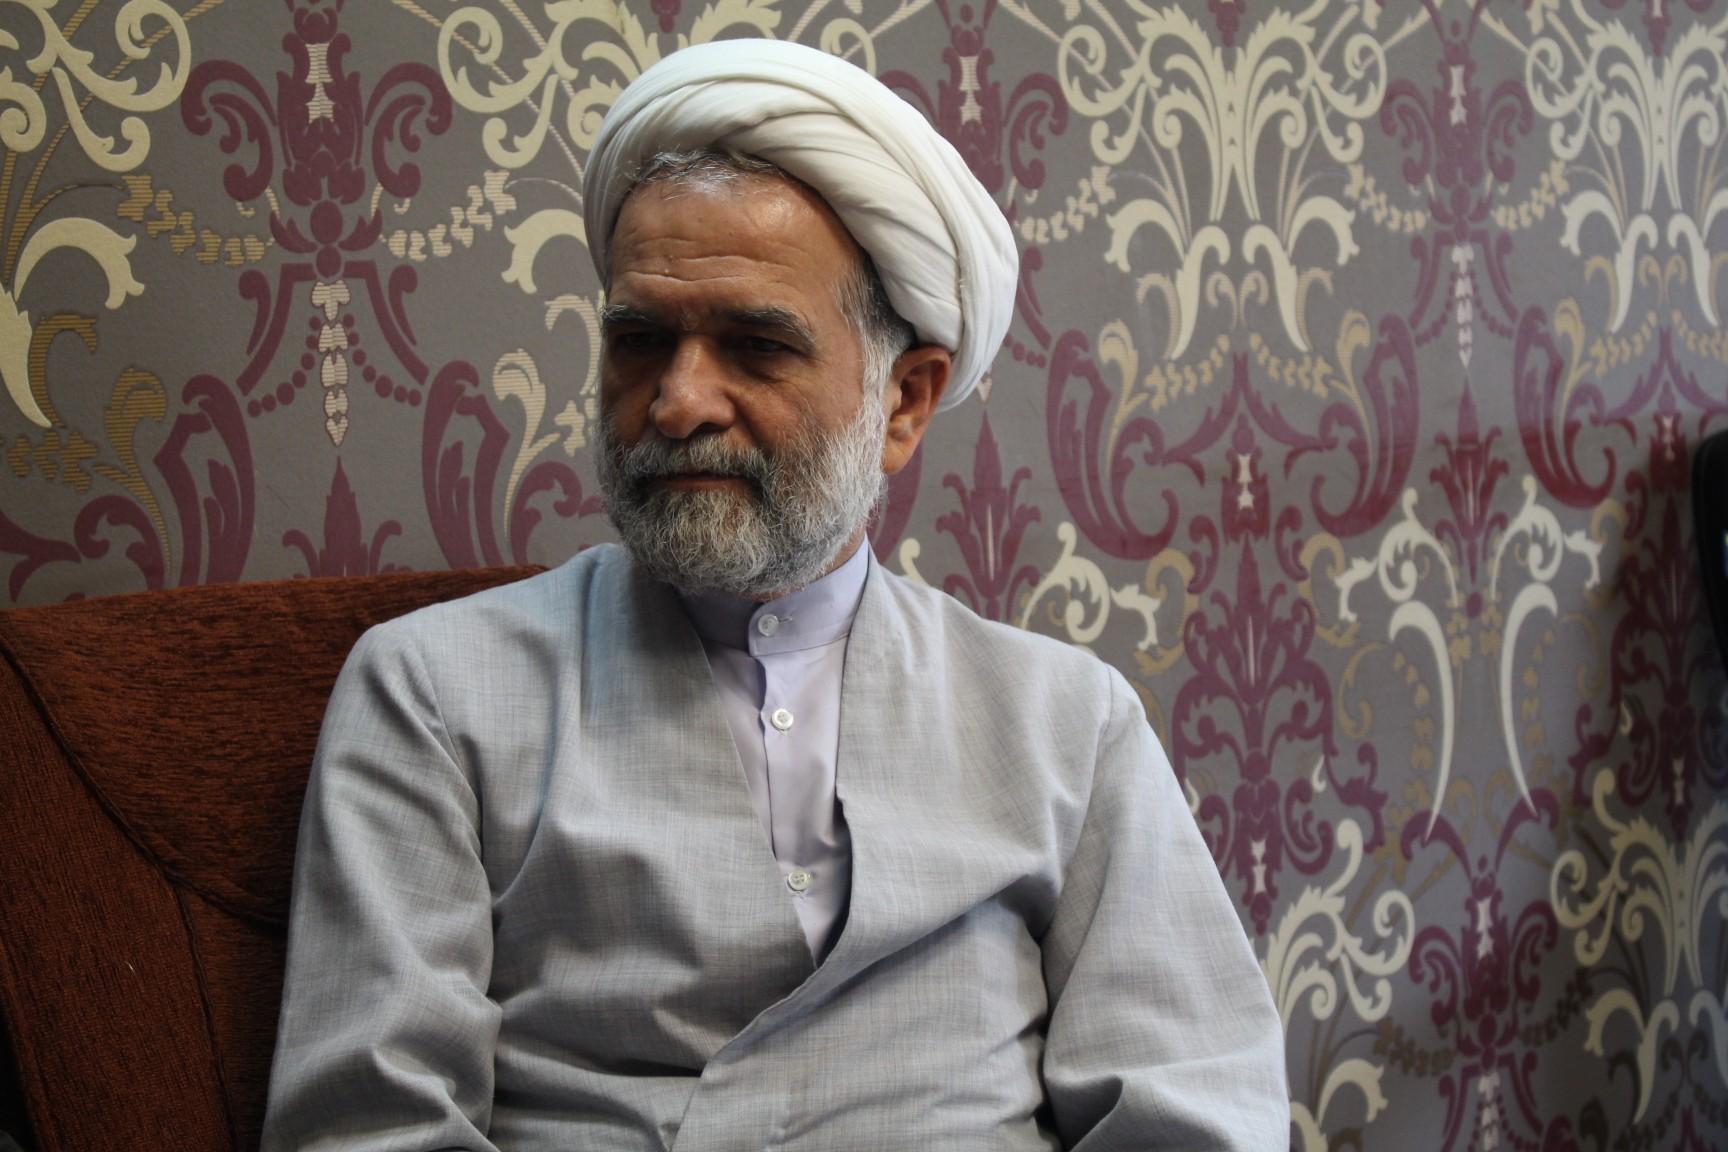 حجت الاسلام والمسلمین محمدحسین کبیریان